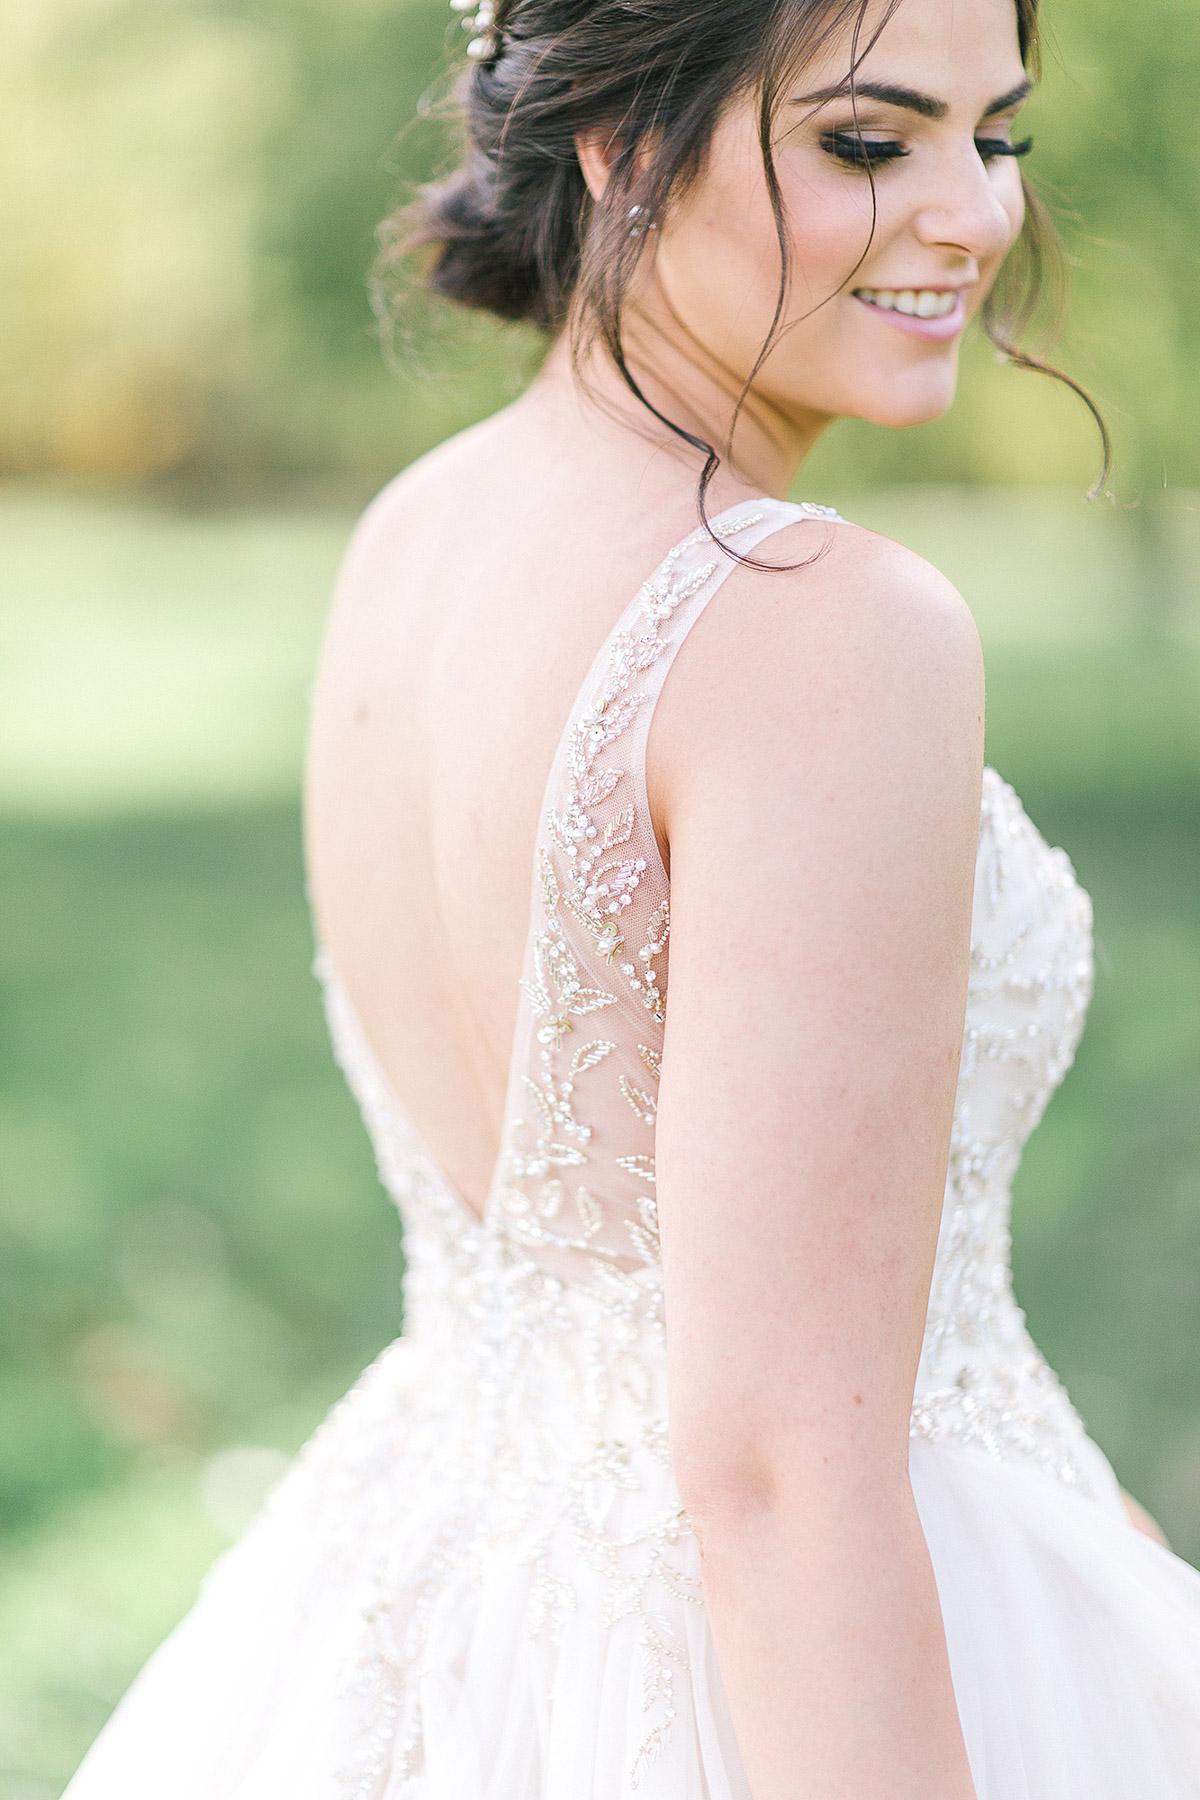 tamara-lockwood-photography-vineyard-bride-swish-list-the-old-courthouse-niagara-on-the-lake-wedding-27.jpg